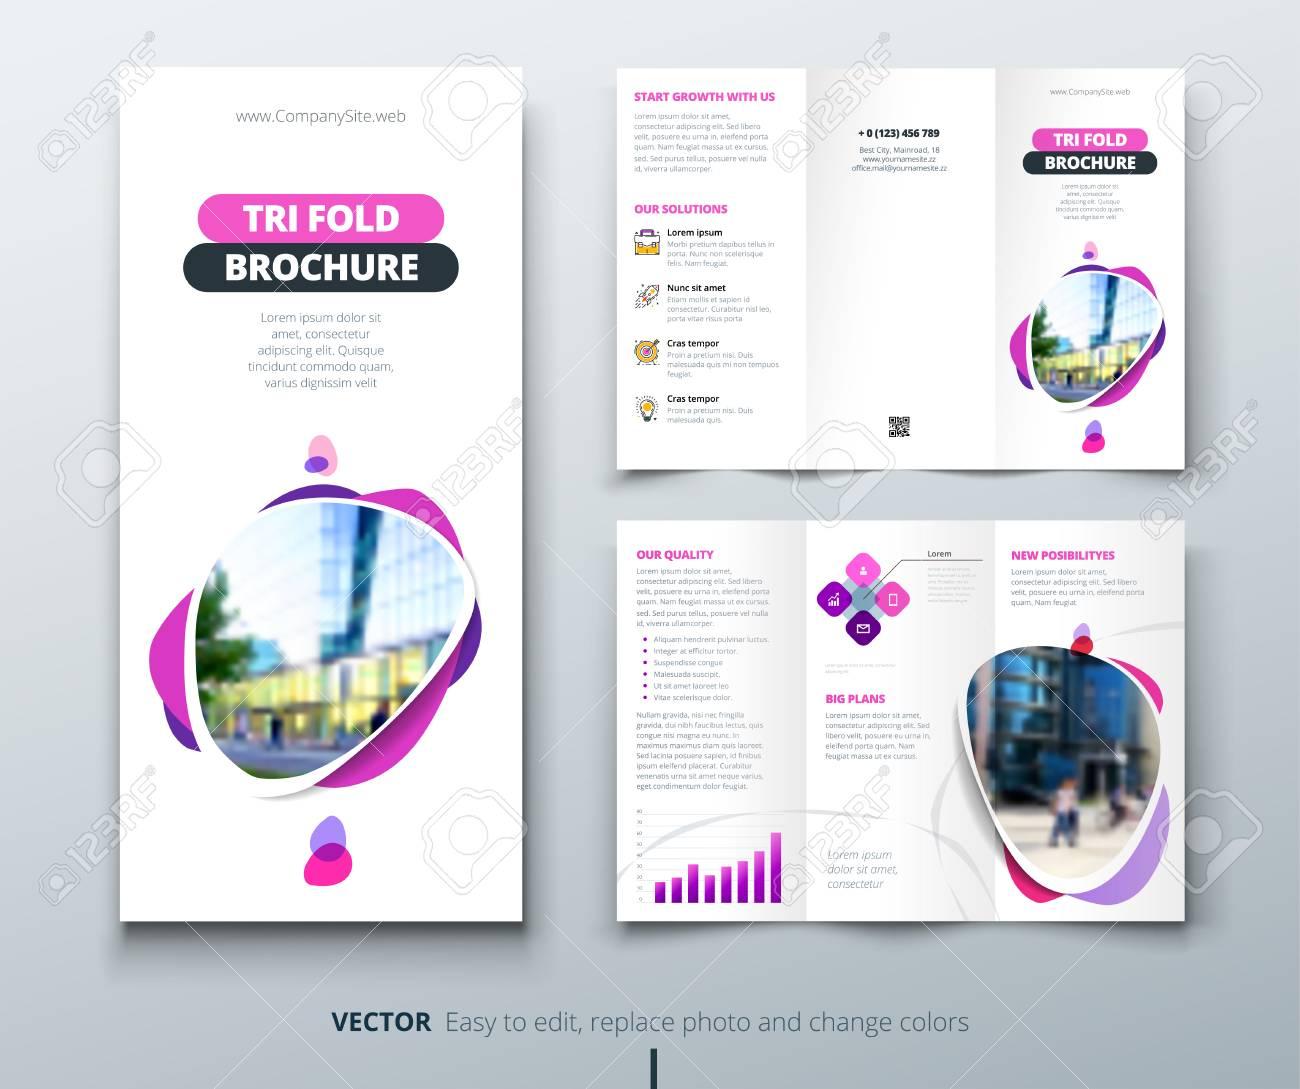 Business tri fold brochure design pink purple template for business tri fold brochure design pink purple template for tri fold flyer layout friedricerecipe Gallery